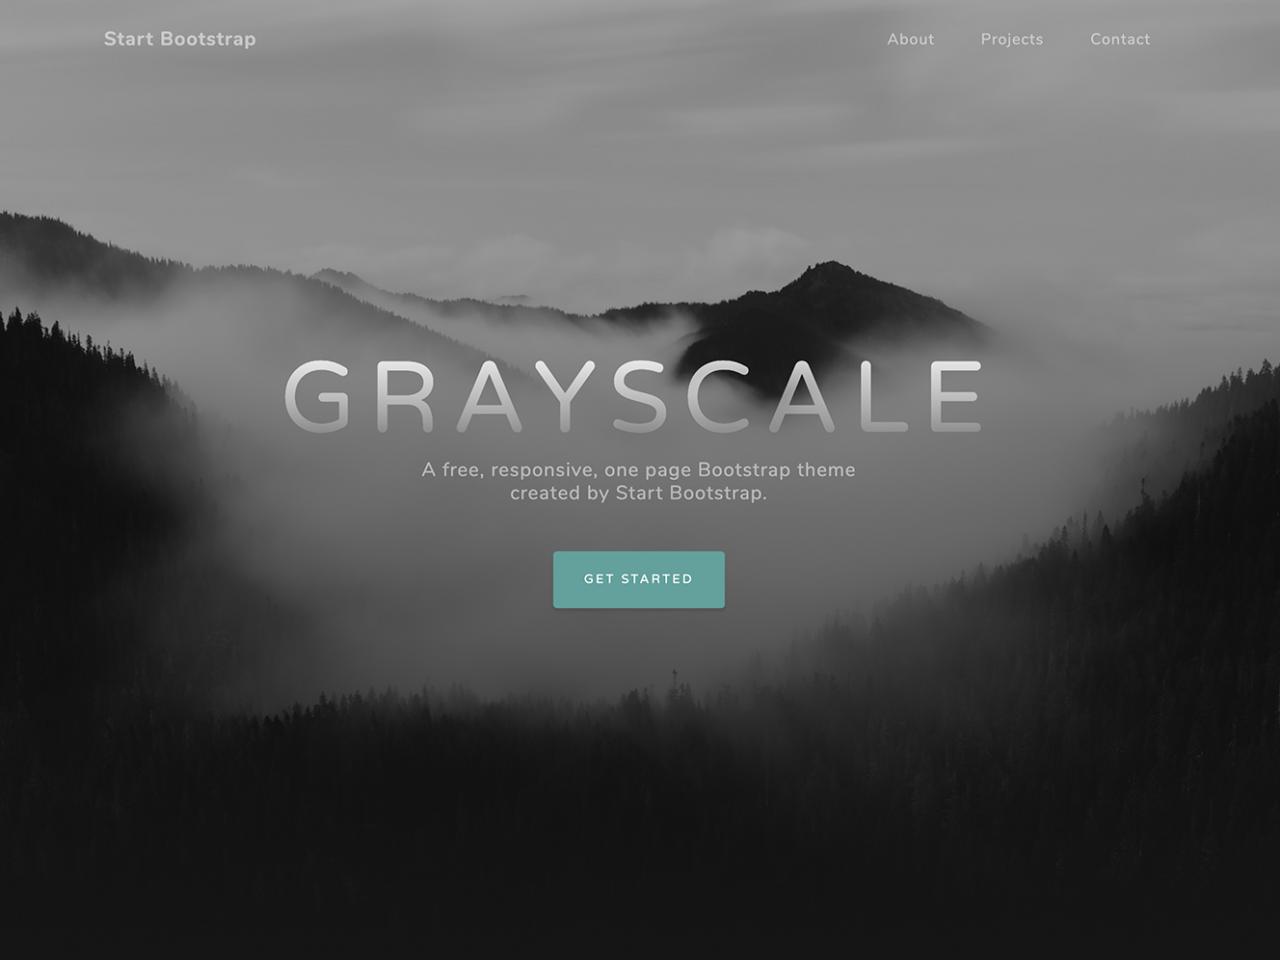 Grayscale-单页模板,网站模板